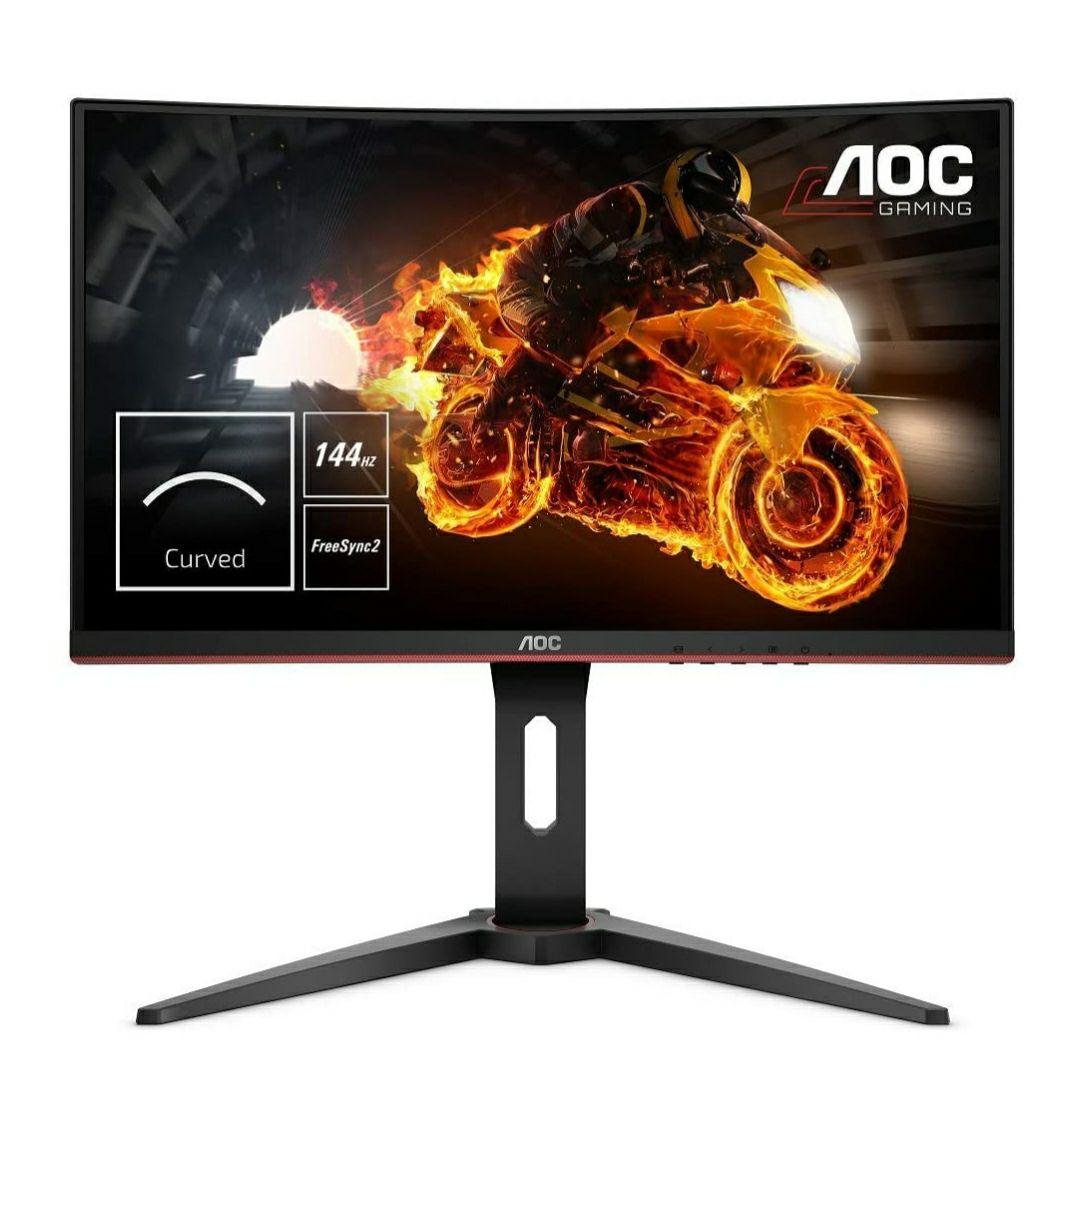 "Monitor - AOC C24G1 24"" Full HD, Curvo, 1 ms, 144 Hz, LED, Flicker Free, FreeSync, Negro/Rojo"